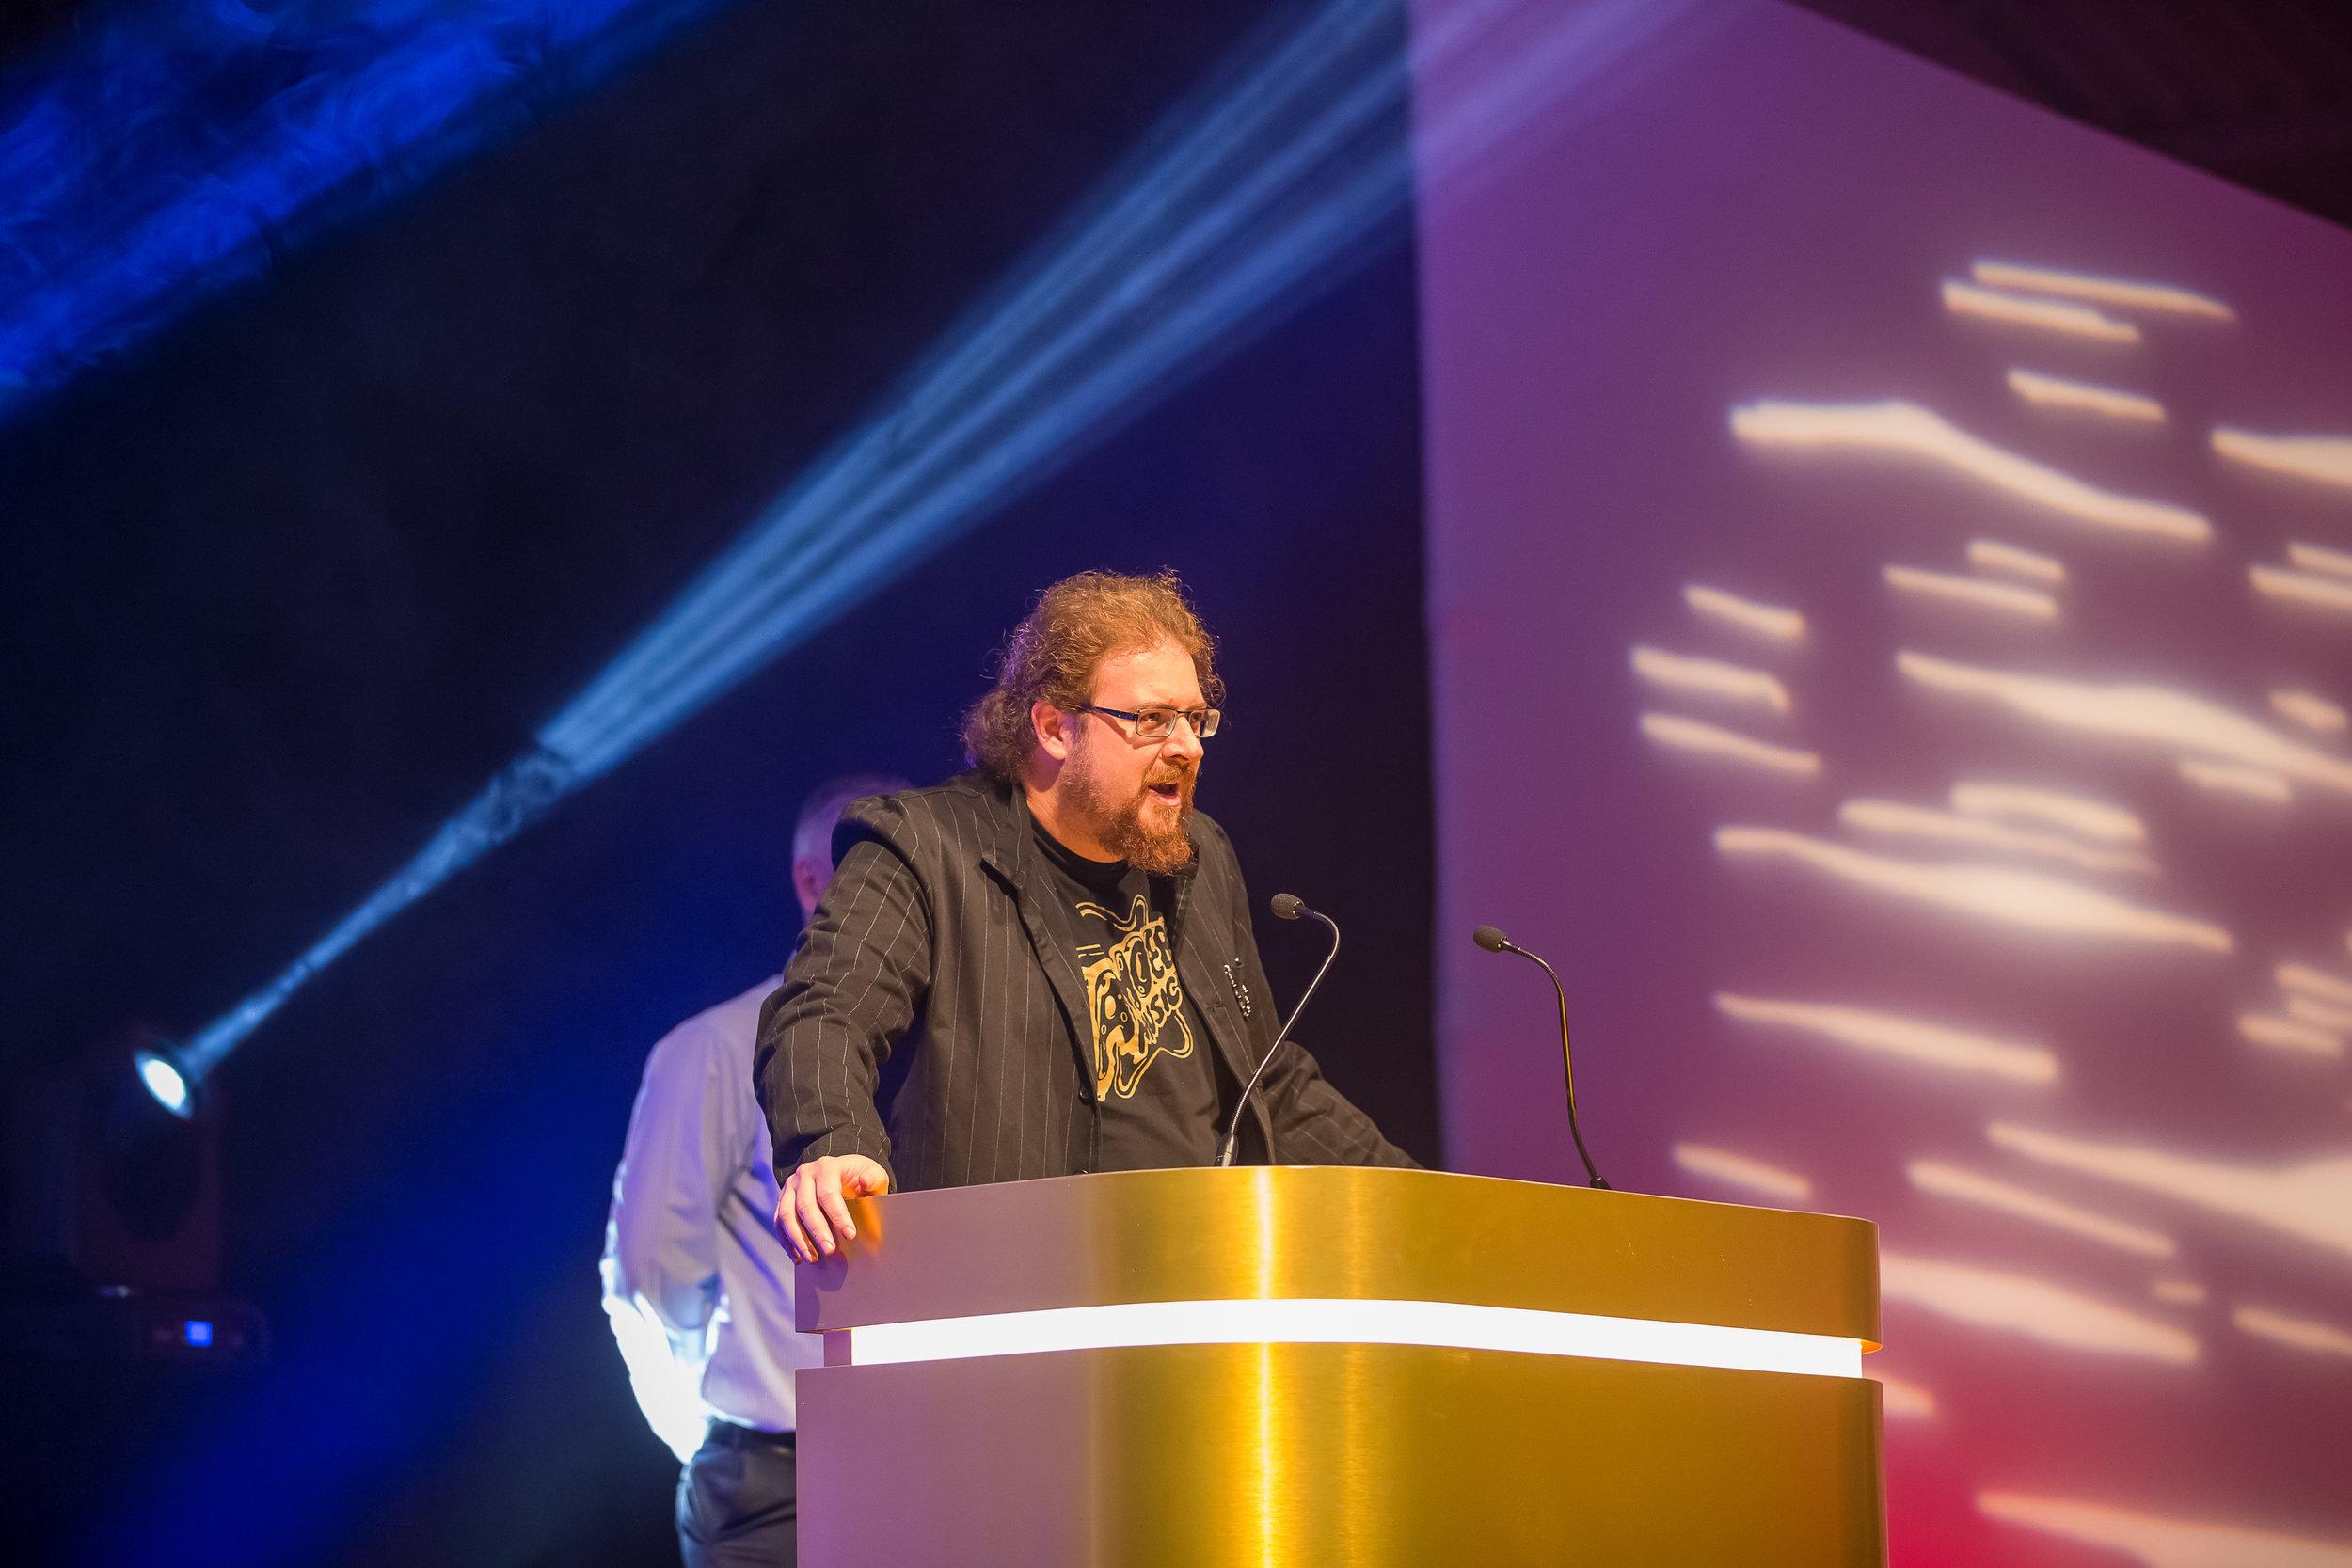 Tom Girard giving a winners speech for winning the Arts Contribution Award.